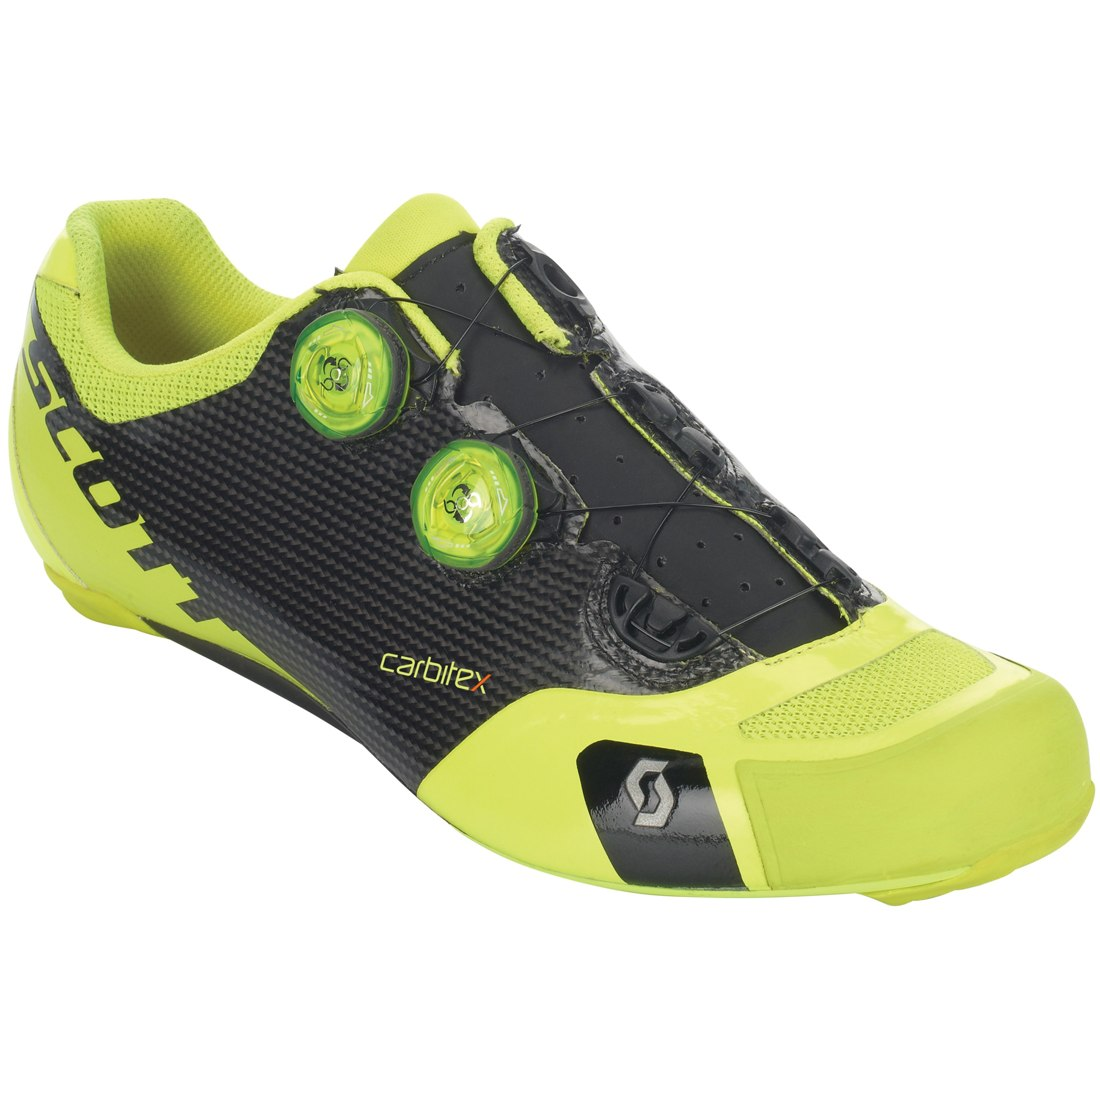 Image of SCOTT Road RC SL Shoe - black/neon yellow